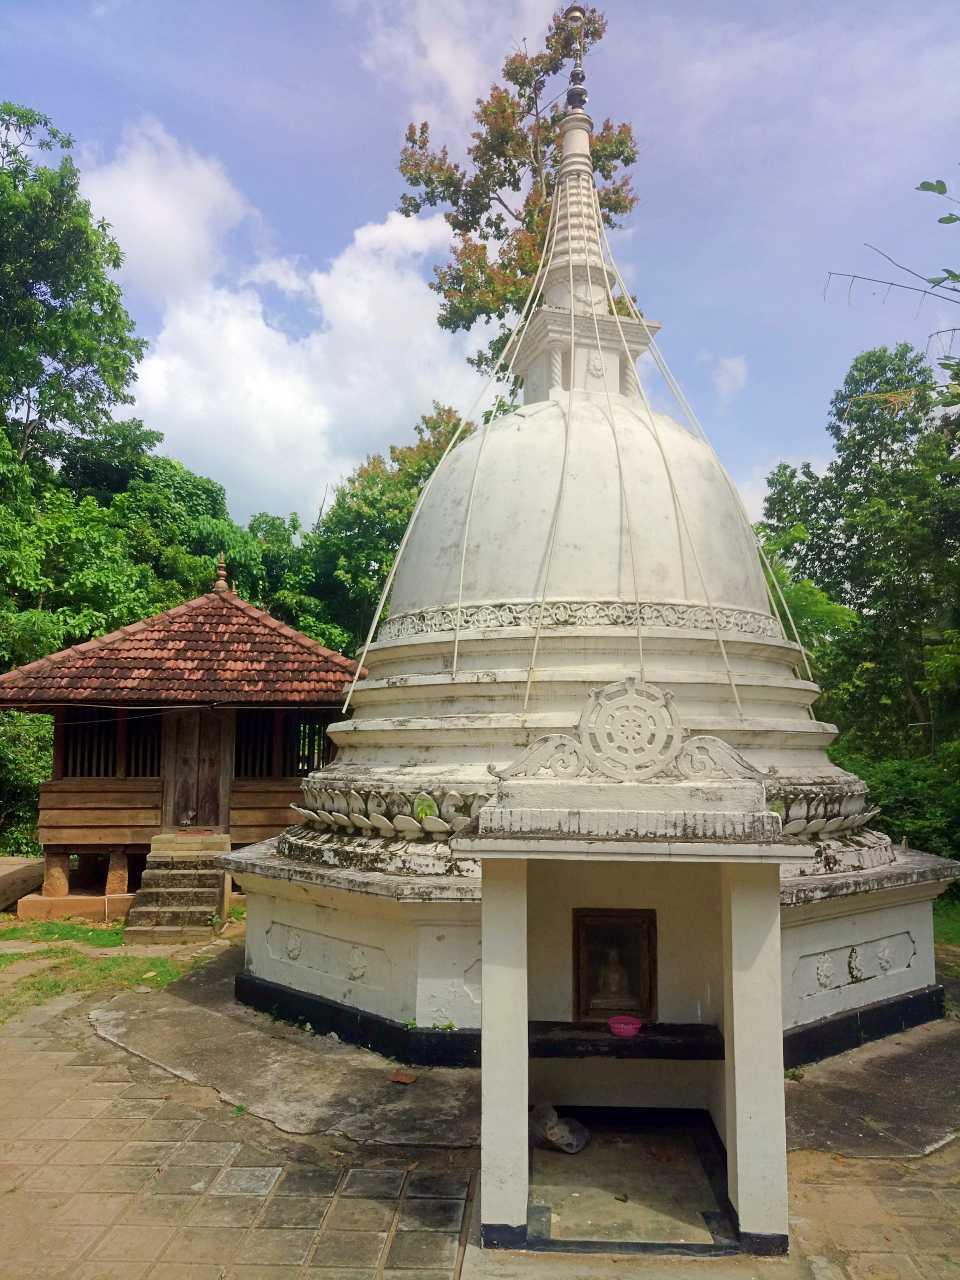 Muruddeniya Kandapita Purana Tampita Viharaya - මුරුද්දෙනිය කන්දපිට පුරාණ ටැම්පිට විහාරය